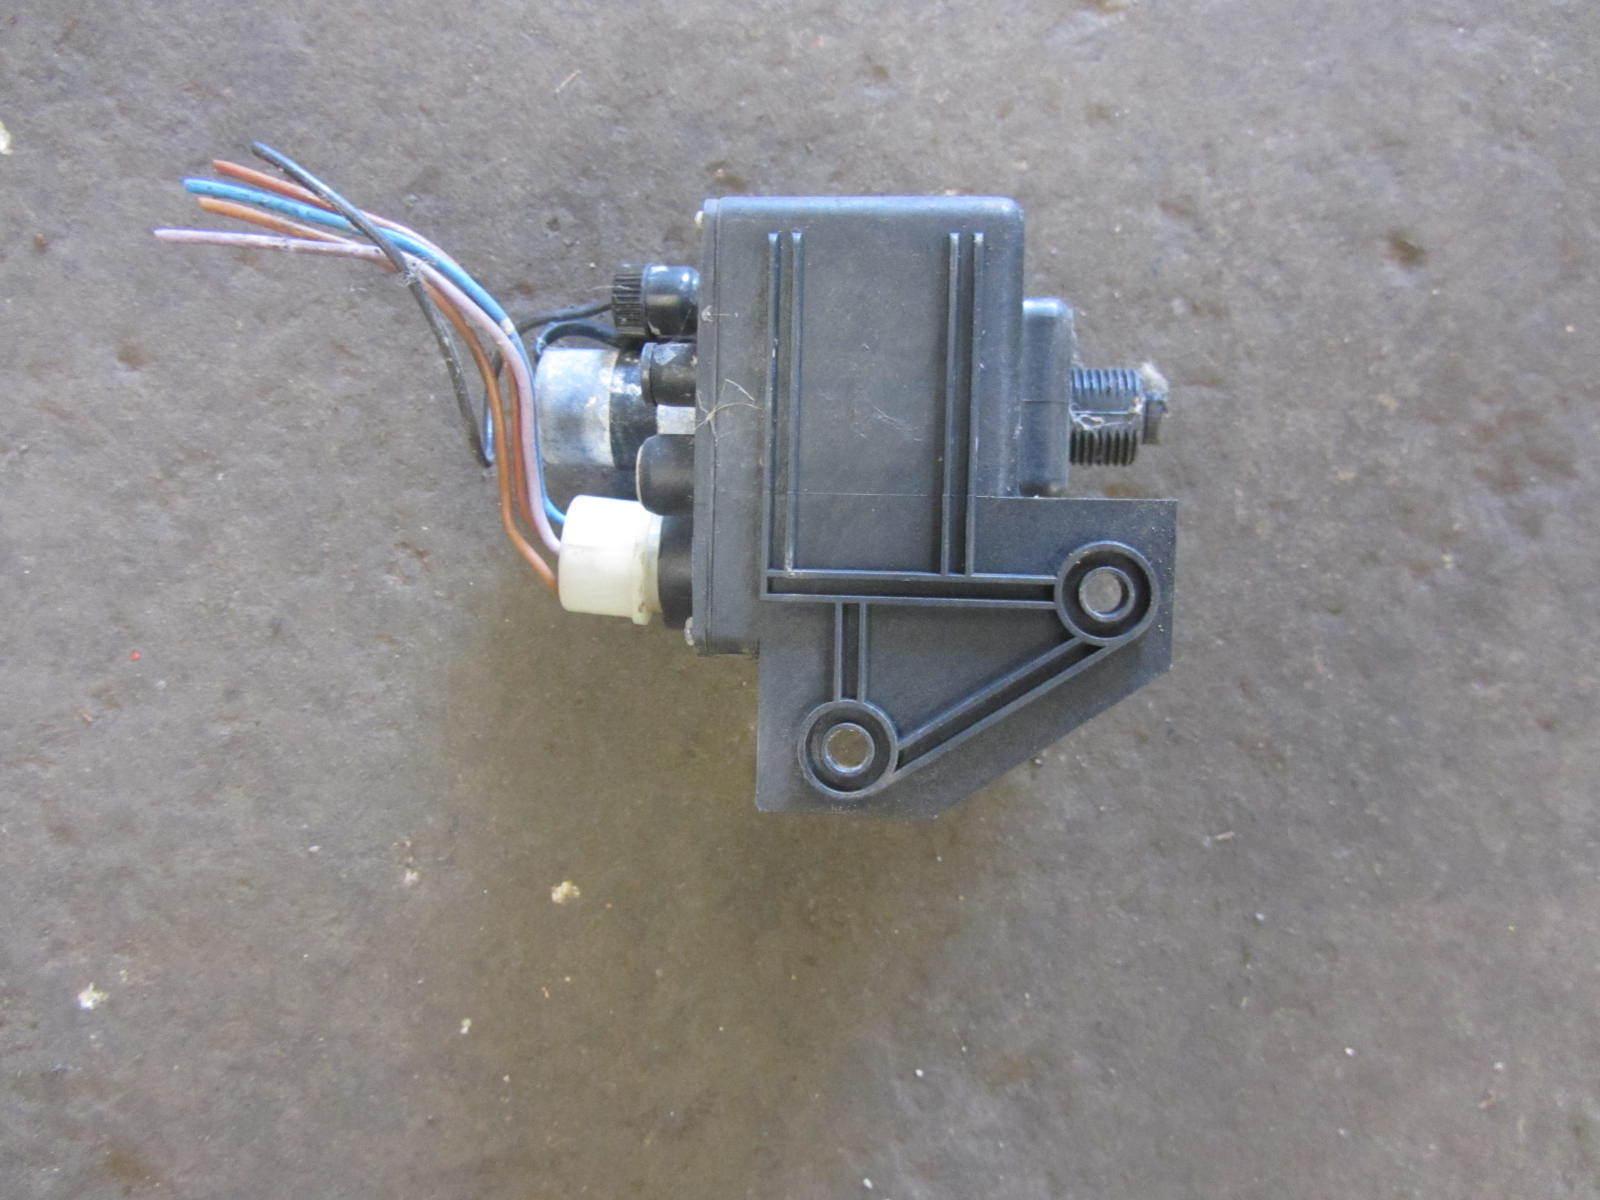 82 Porsche 928 Catalytic Converter Reset Switch 92864122500 Oem Ebay Power Window Wiring Norton Secured Powered By Verisign